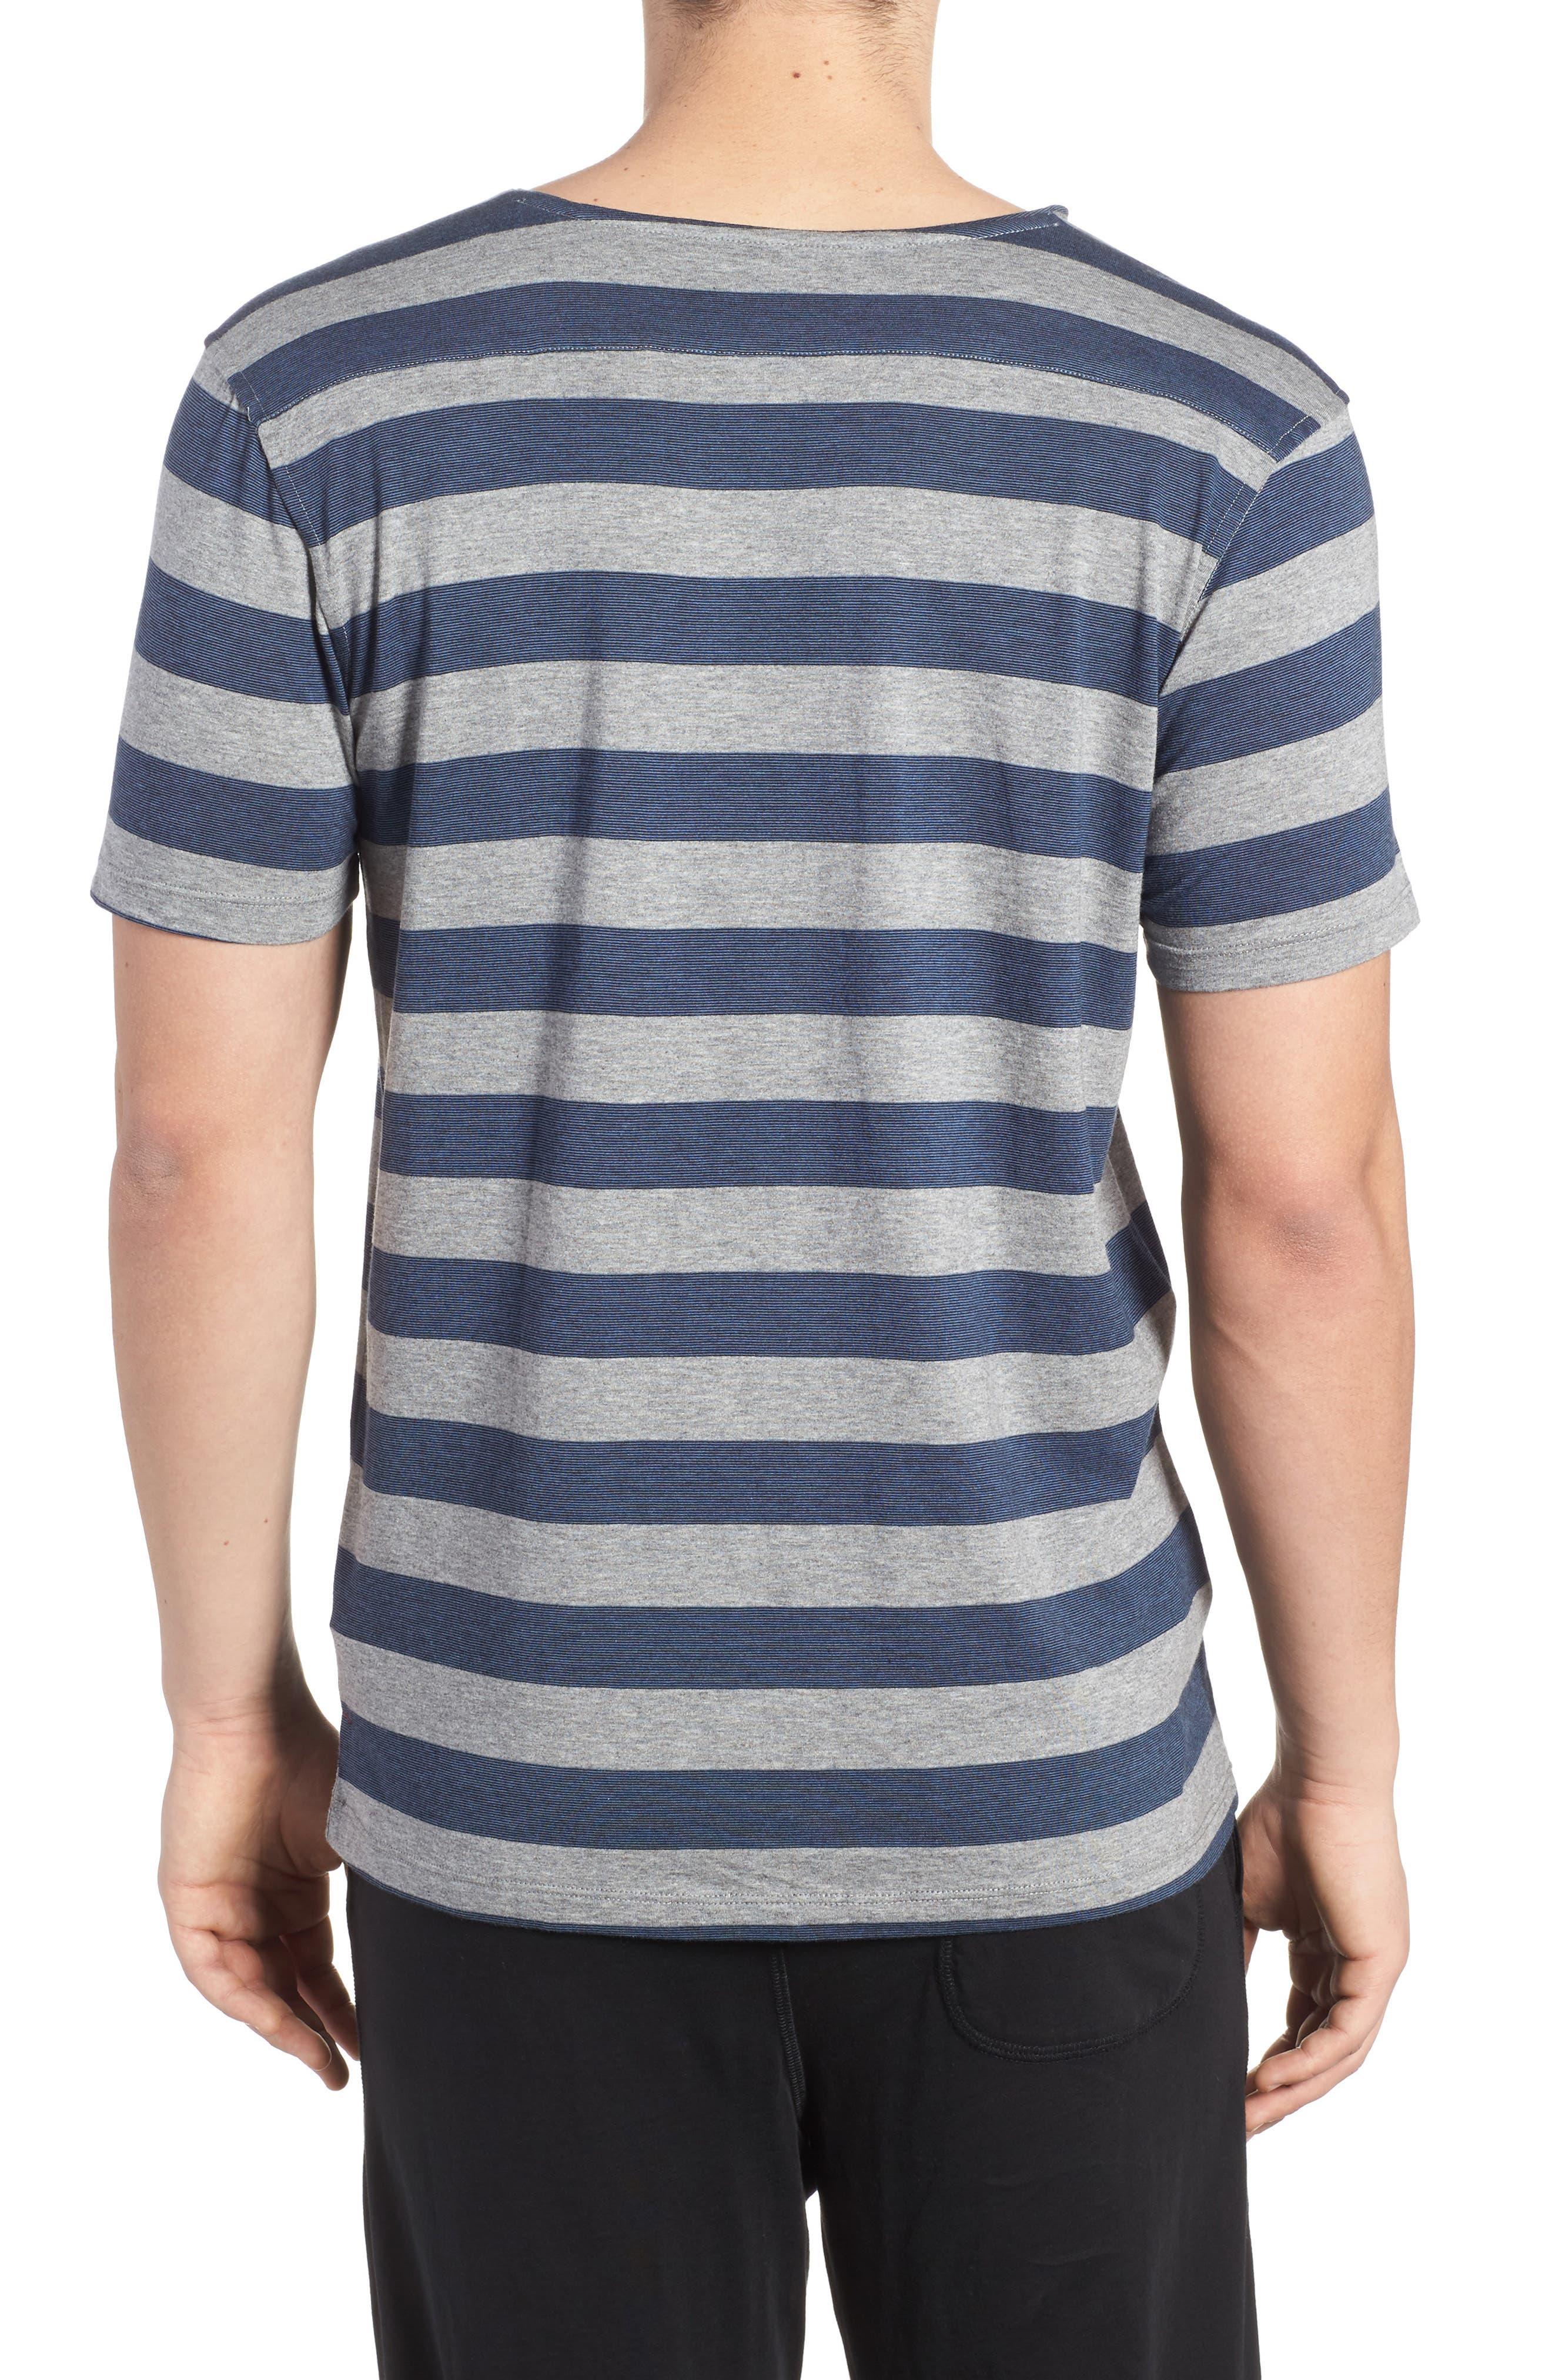 Alternate Image 2  - Daniel Buchler Stripe Pima Cotton & Modal V-Neck T-Shirt